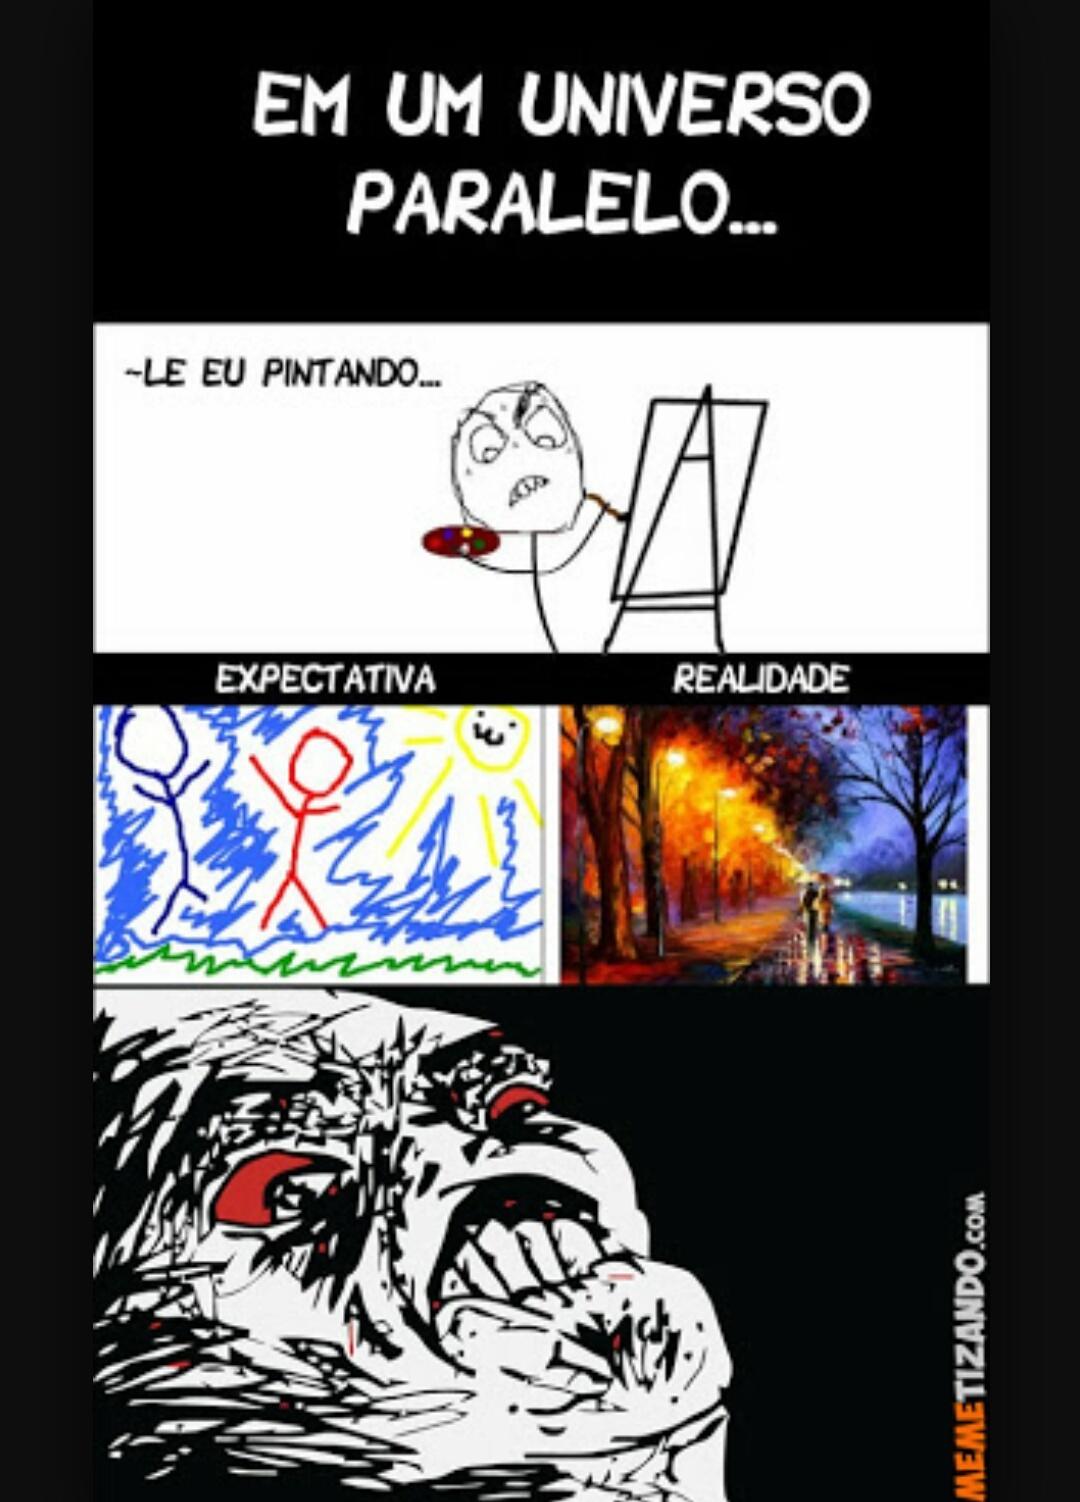 Paralele universe - meme